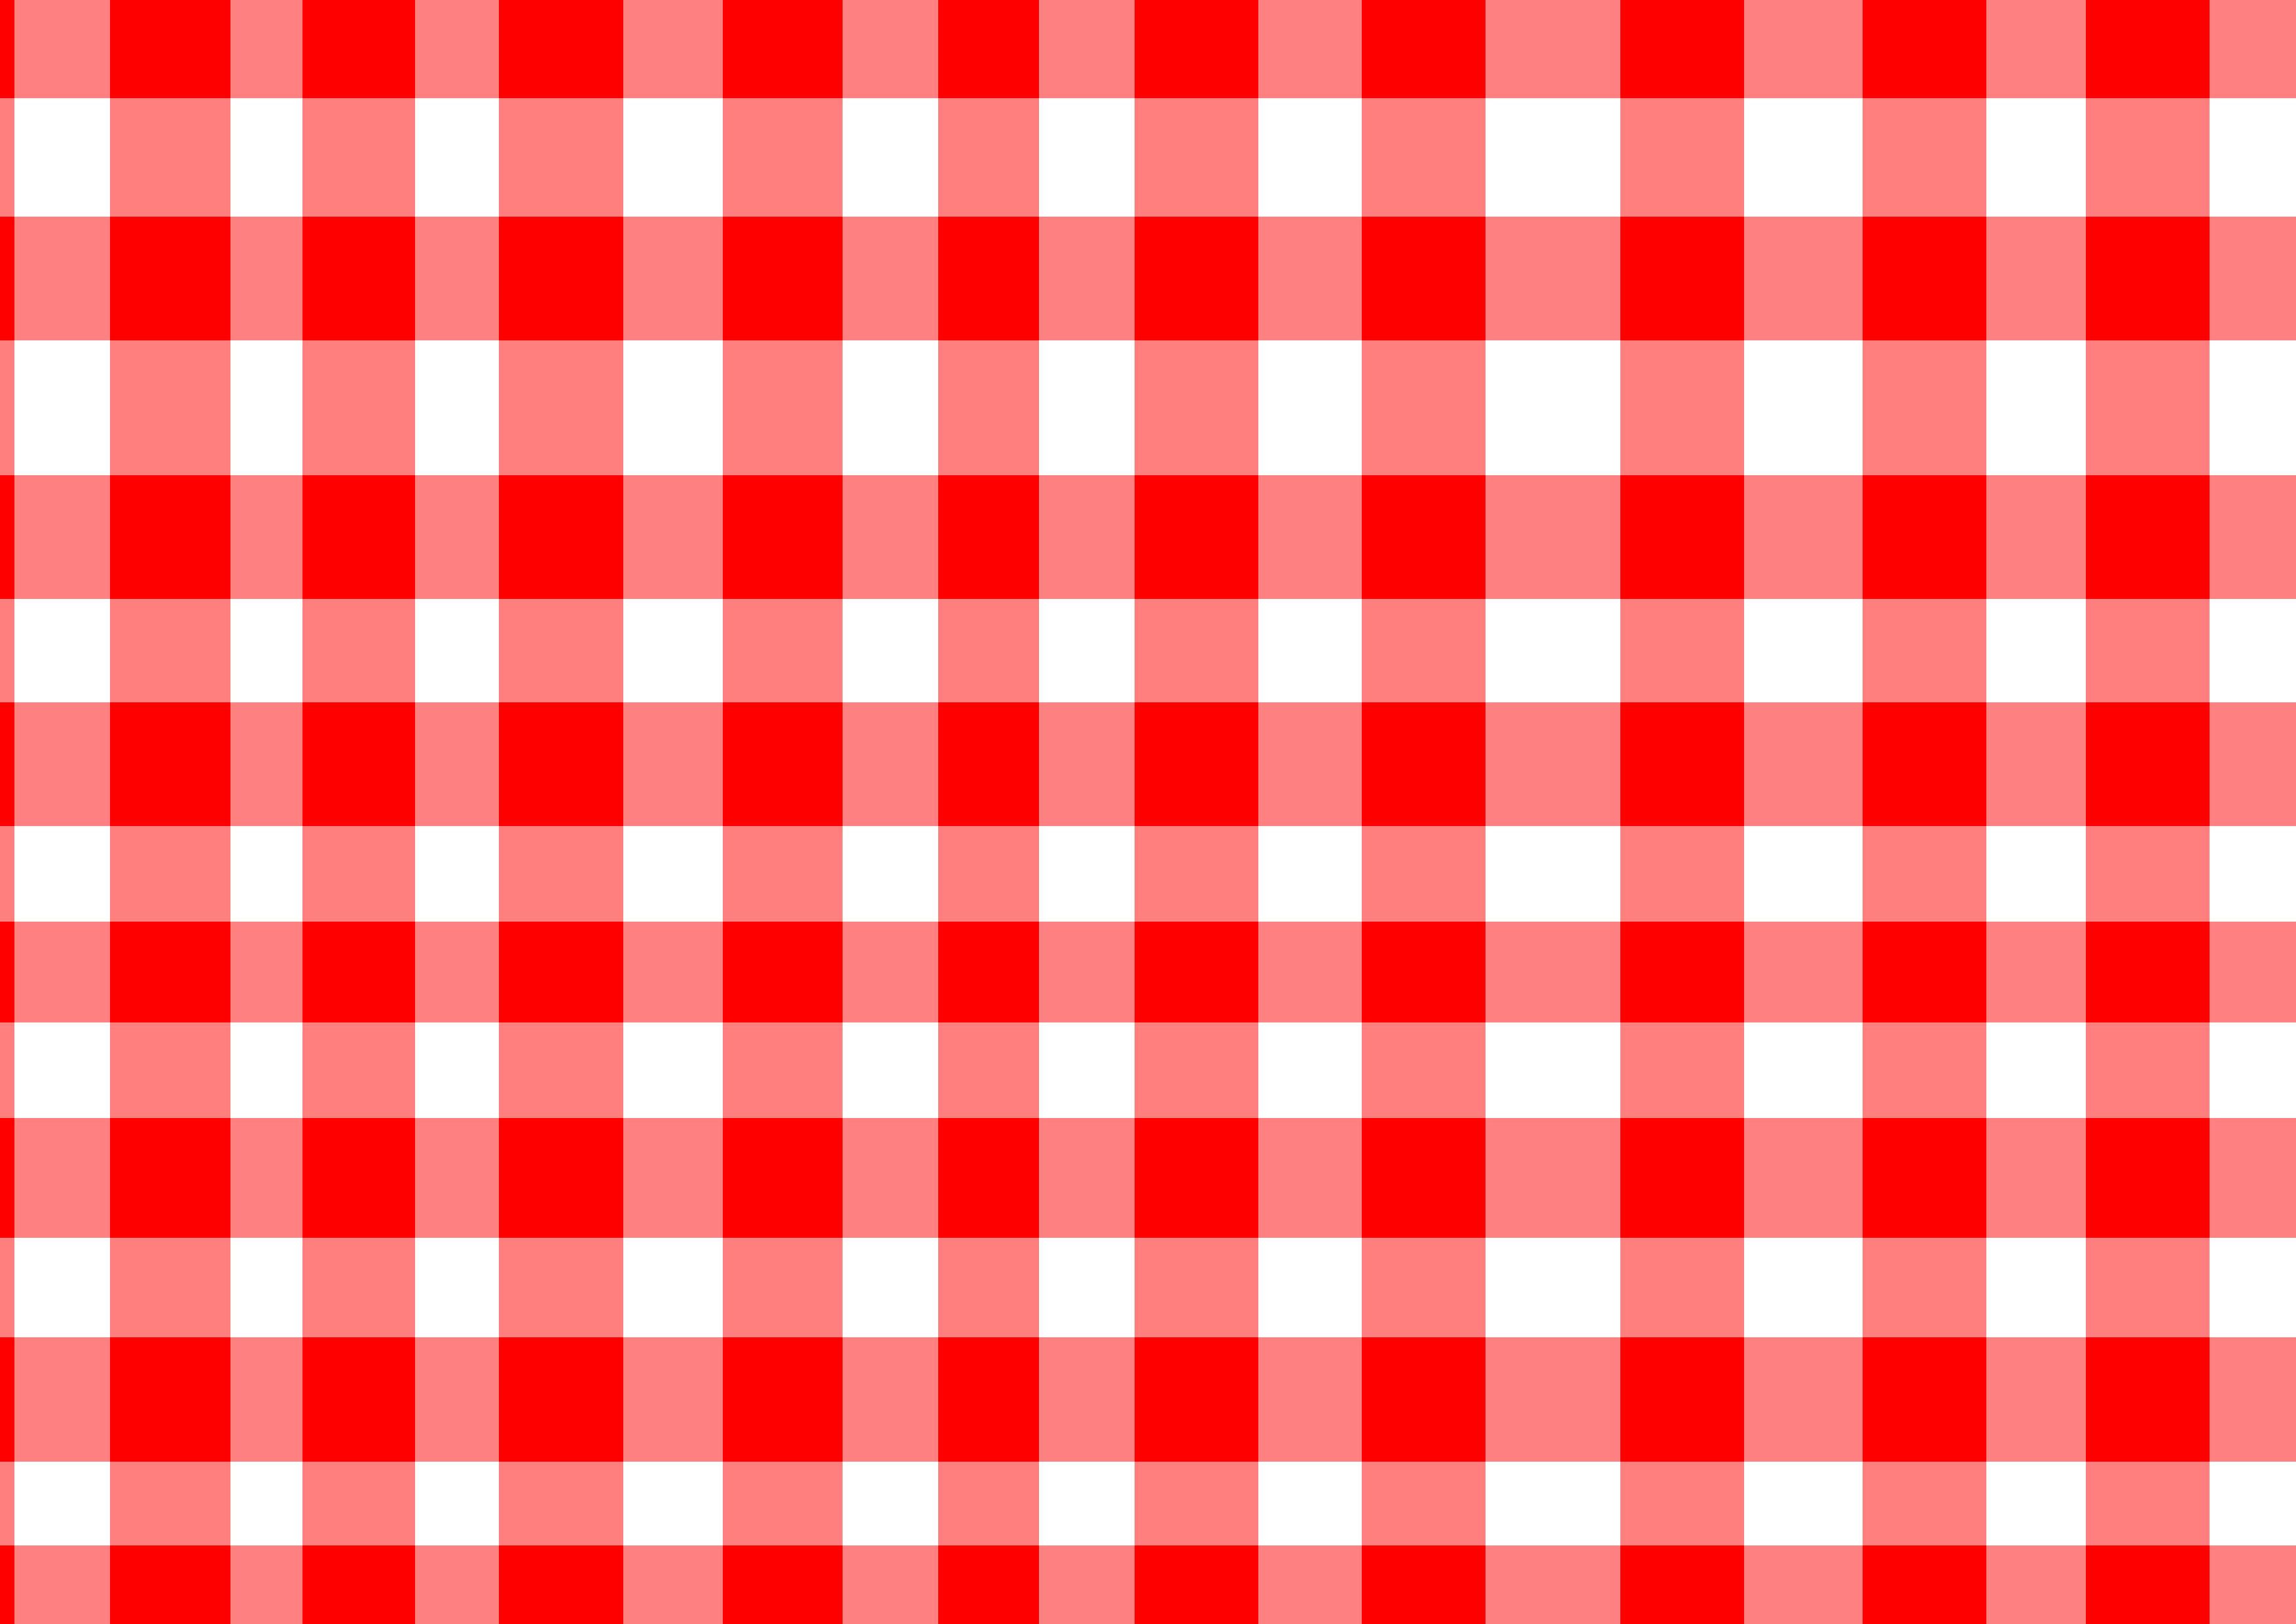 Blanket clipart picnic mat. Eventticketsprinting co